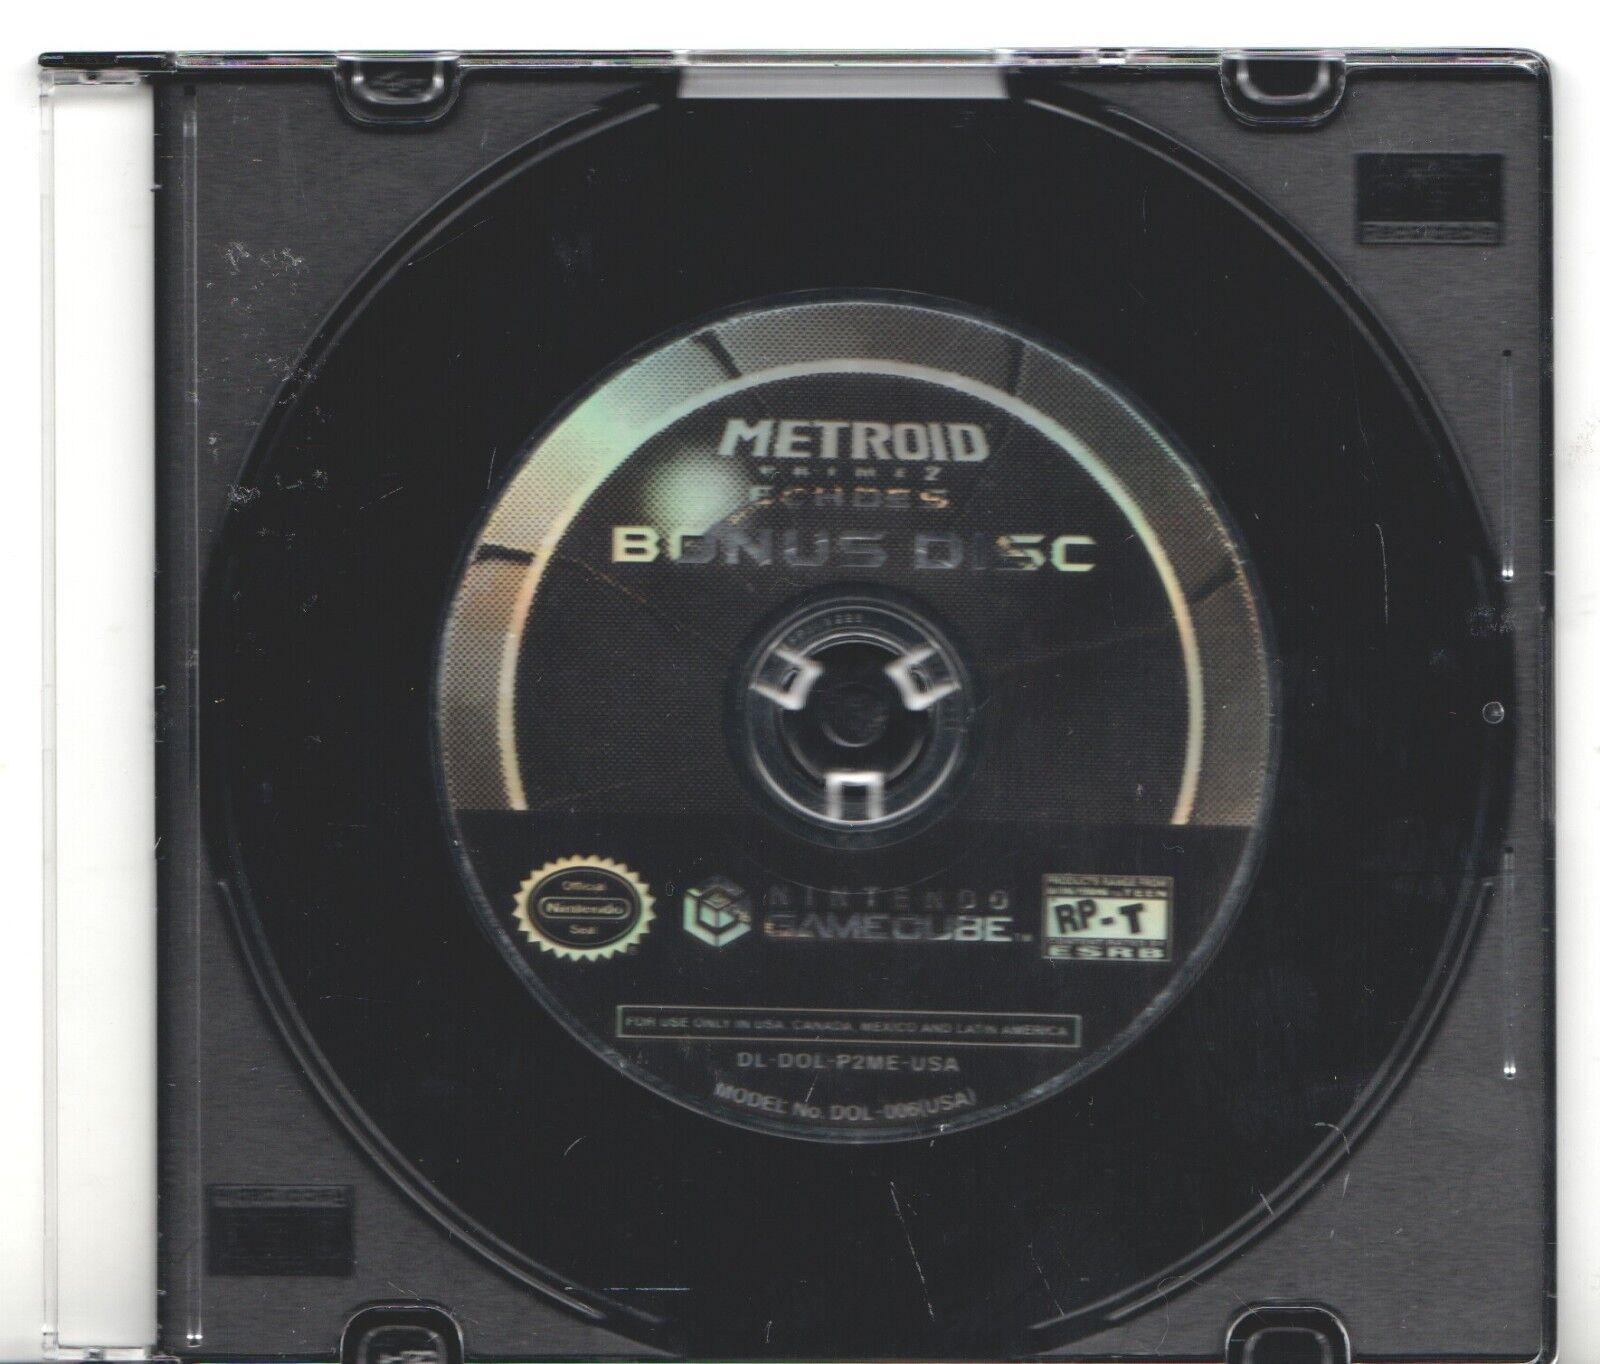 Video Game Only - METROID PRIME 2 ECHOES BONUS DISC - Nintendo GameCube